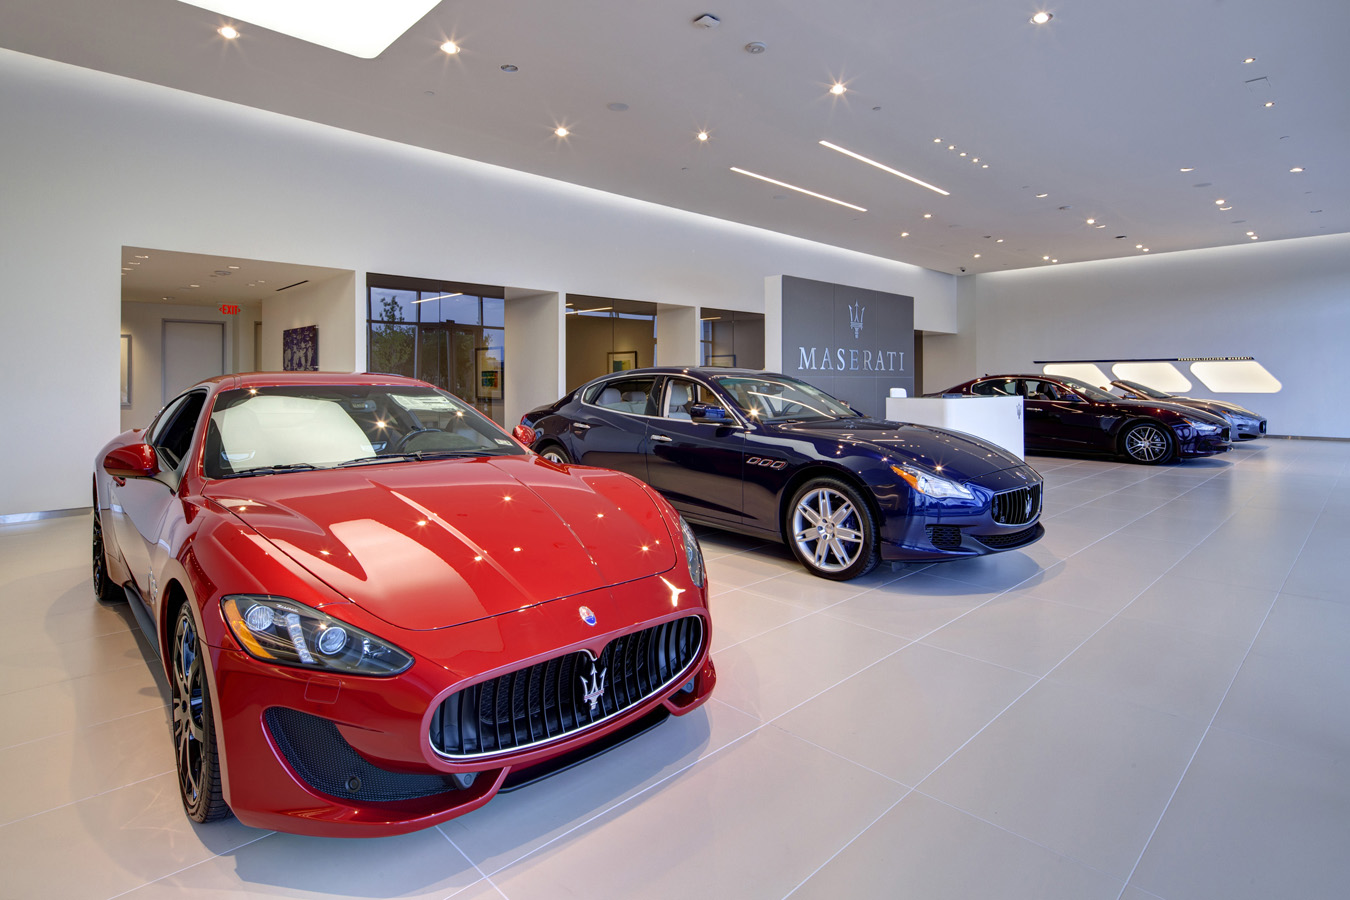 Maserati Fort Worth (New & Used Maserati Car Dealership)